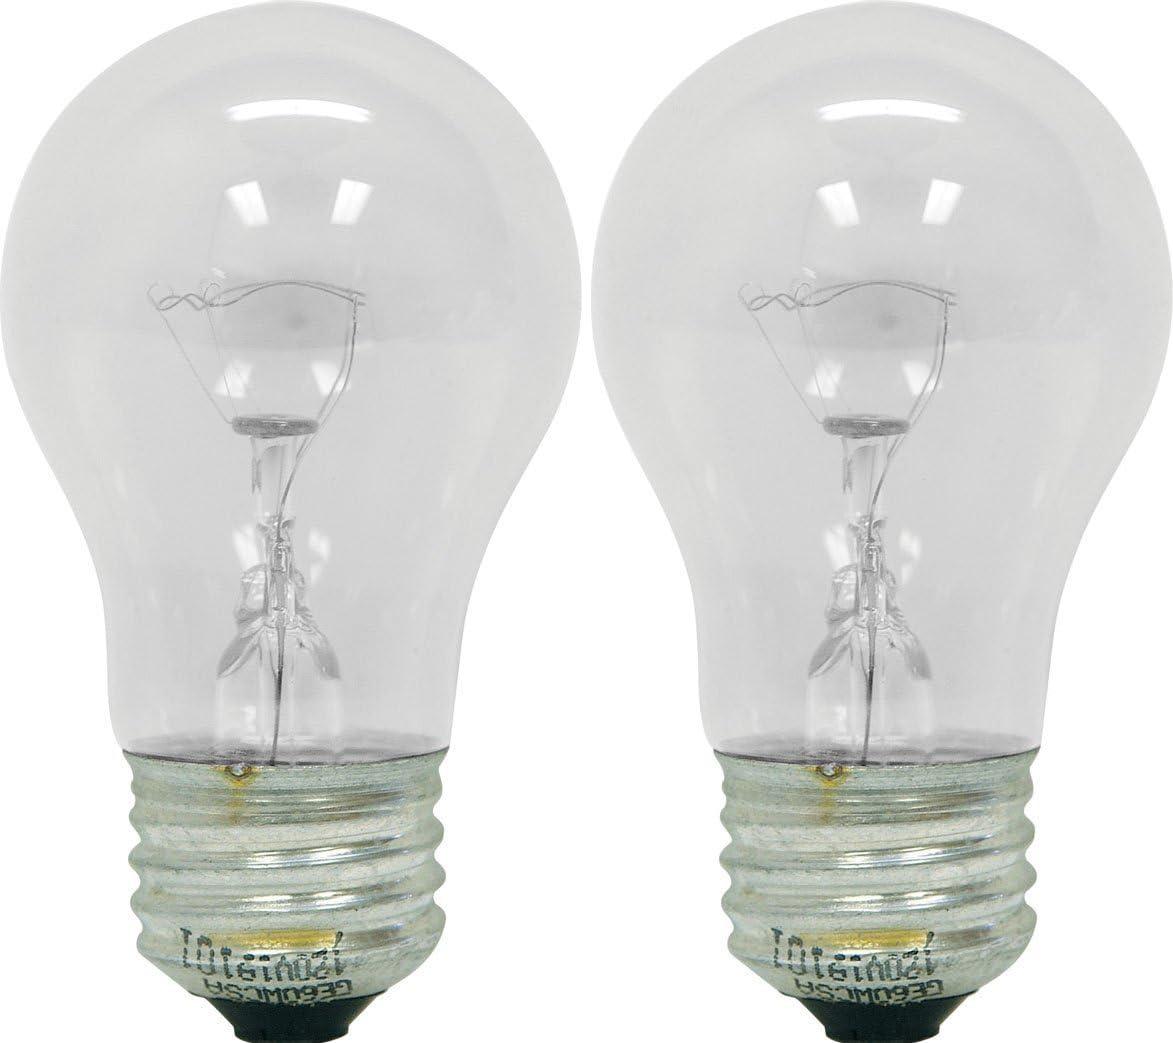 Appliance Oven Refrigerator Bulbs, A15 Shape Appliance Bulb, 40 Watt, High Temp, E27 Medium Base, Clear Glass, Oven Bulbs